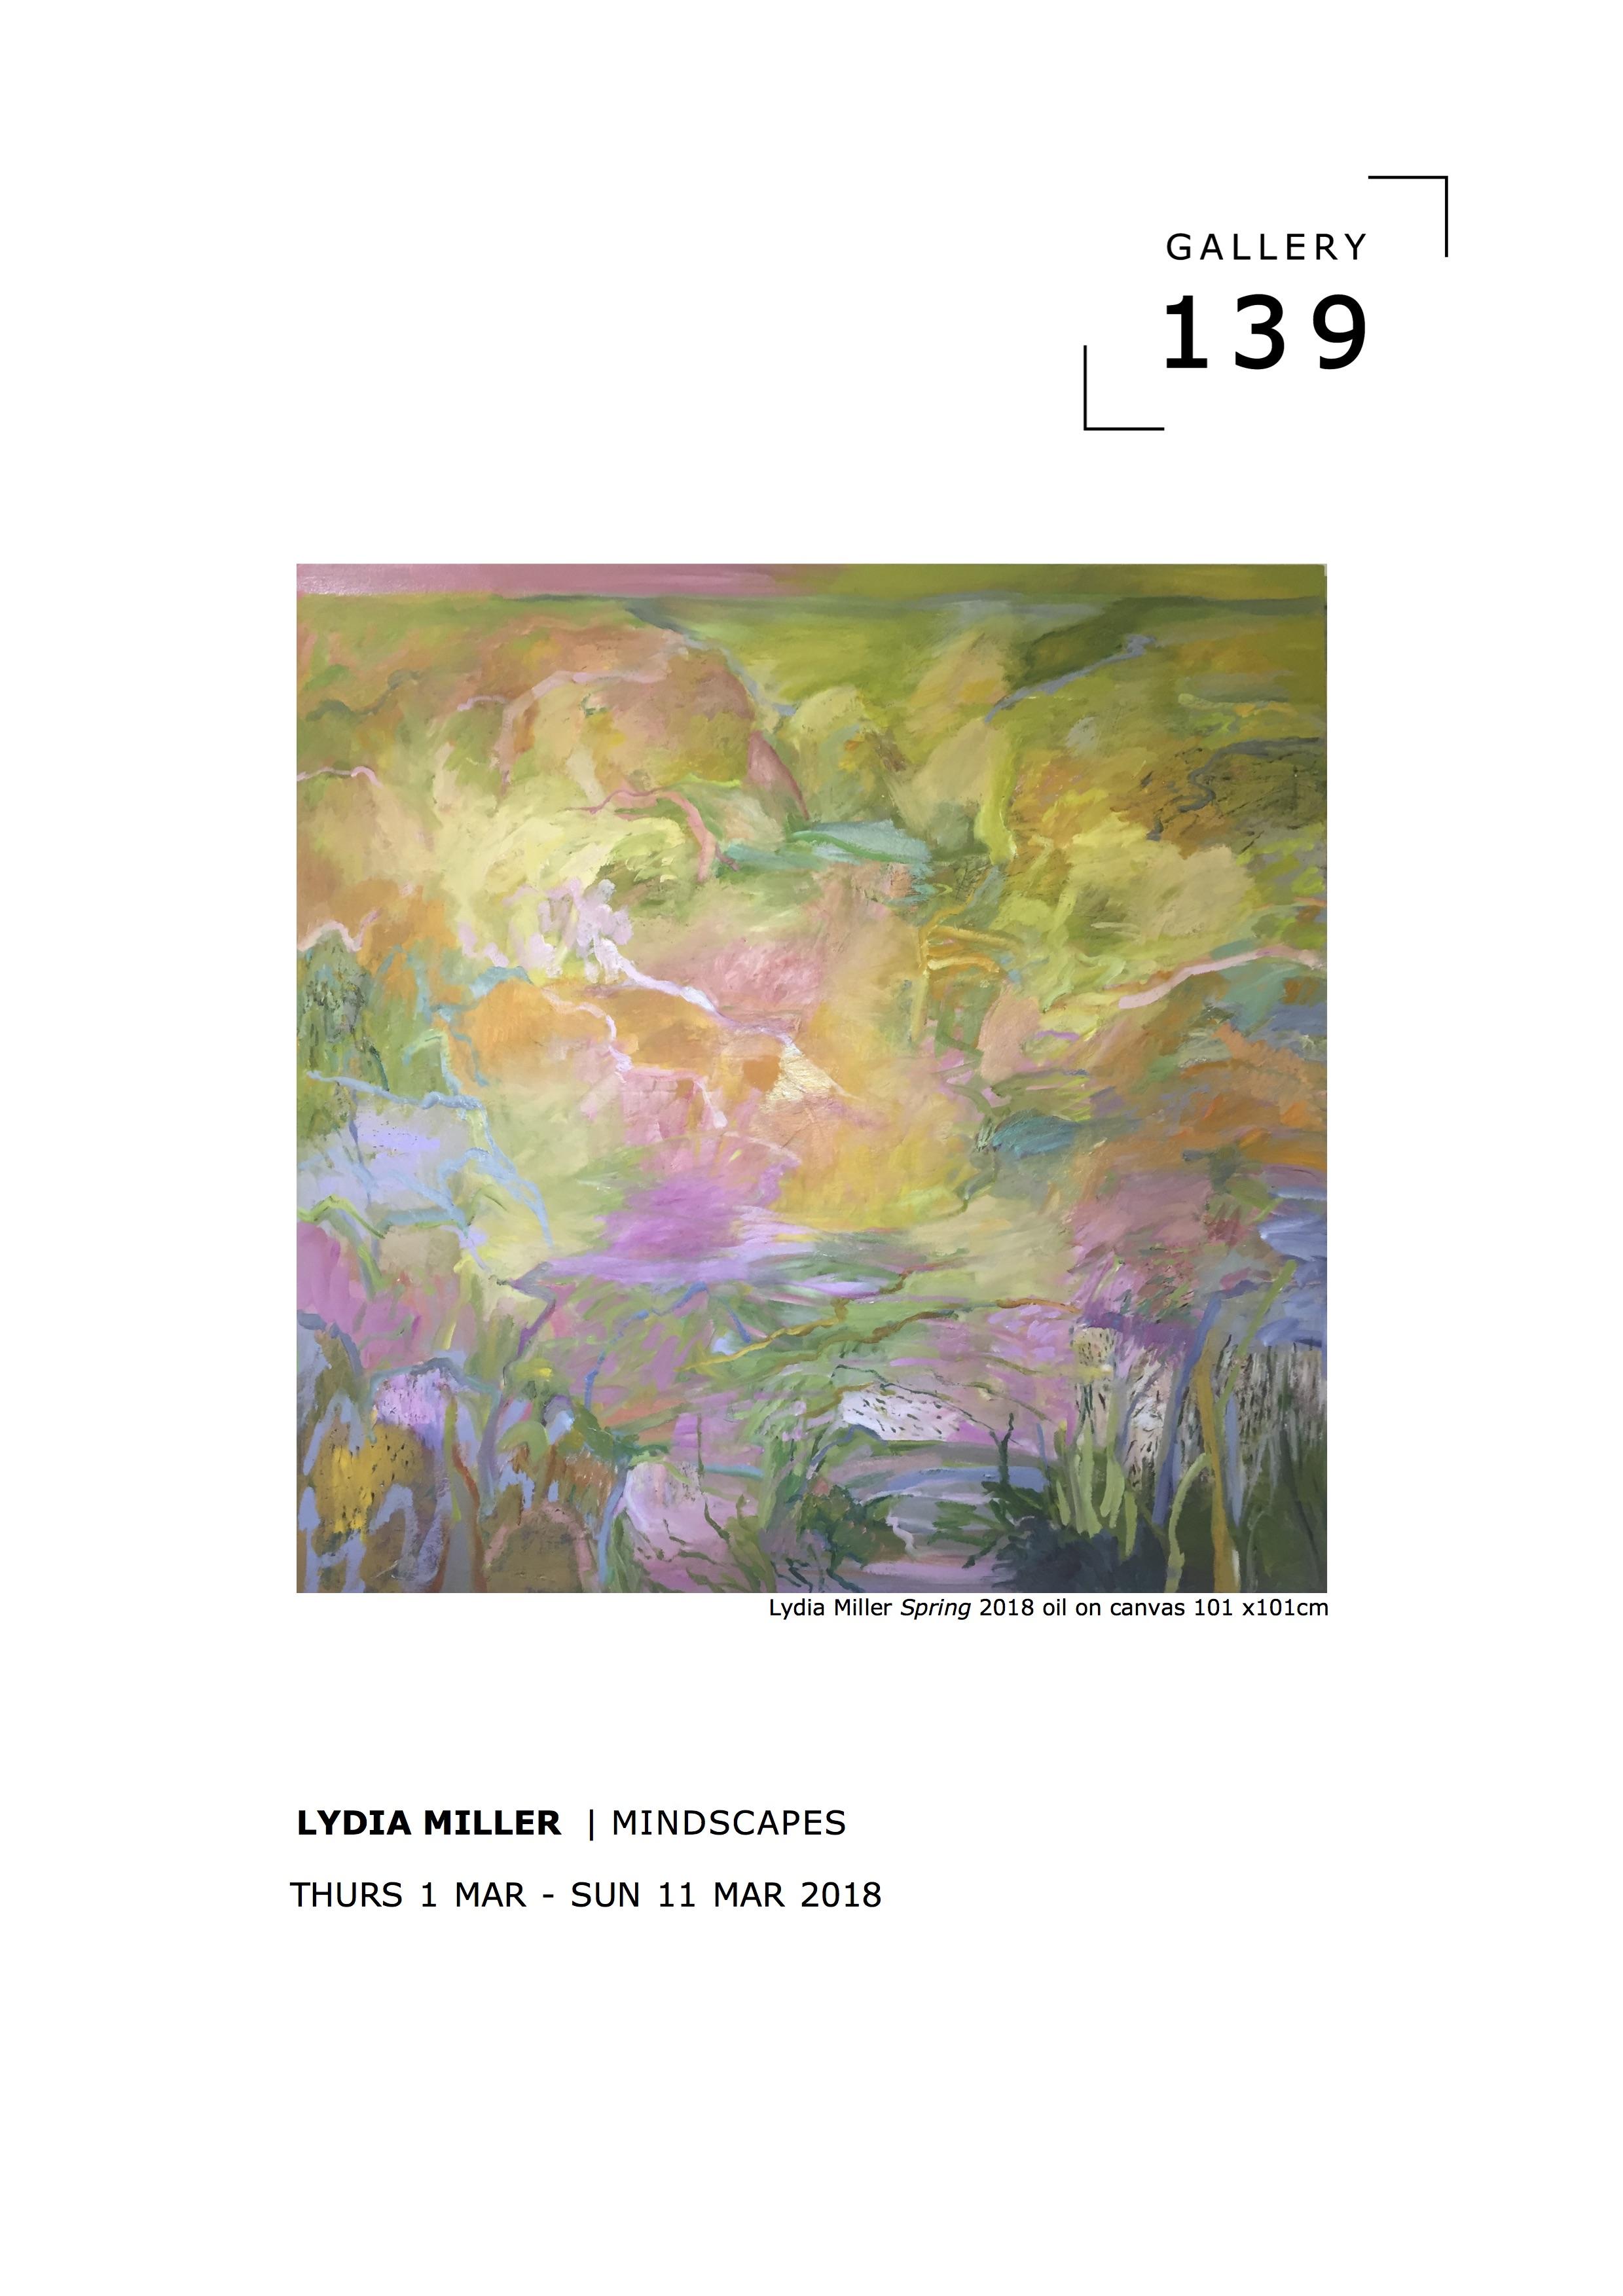 Lydia Miller_catalogue_1.jpg